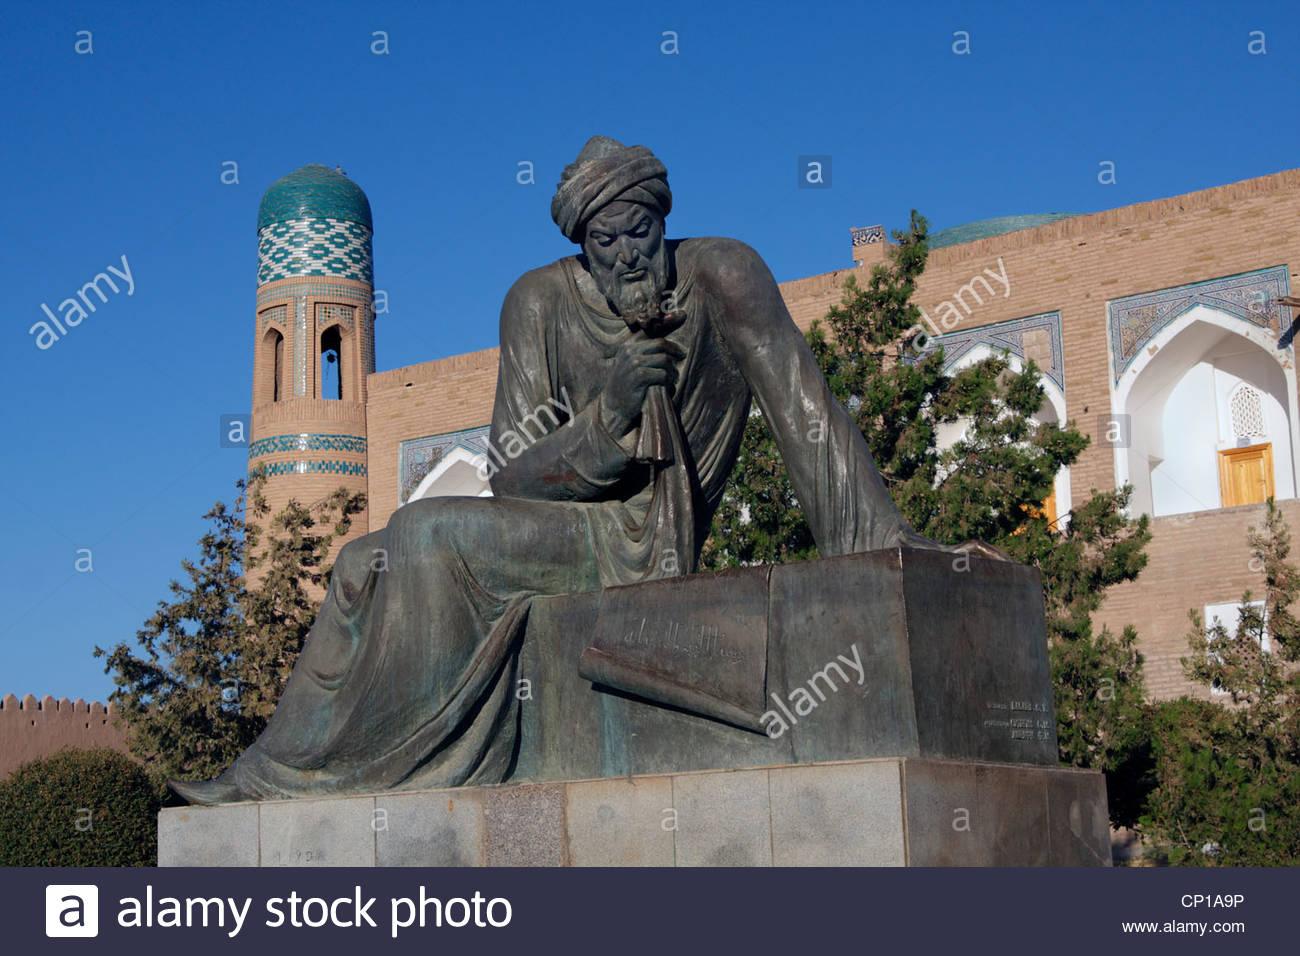 Statue of Al-Khorezmi, 9th century mathematician, Khiva, Uzbekistan - Stock Image